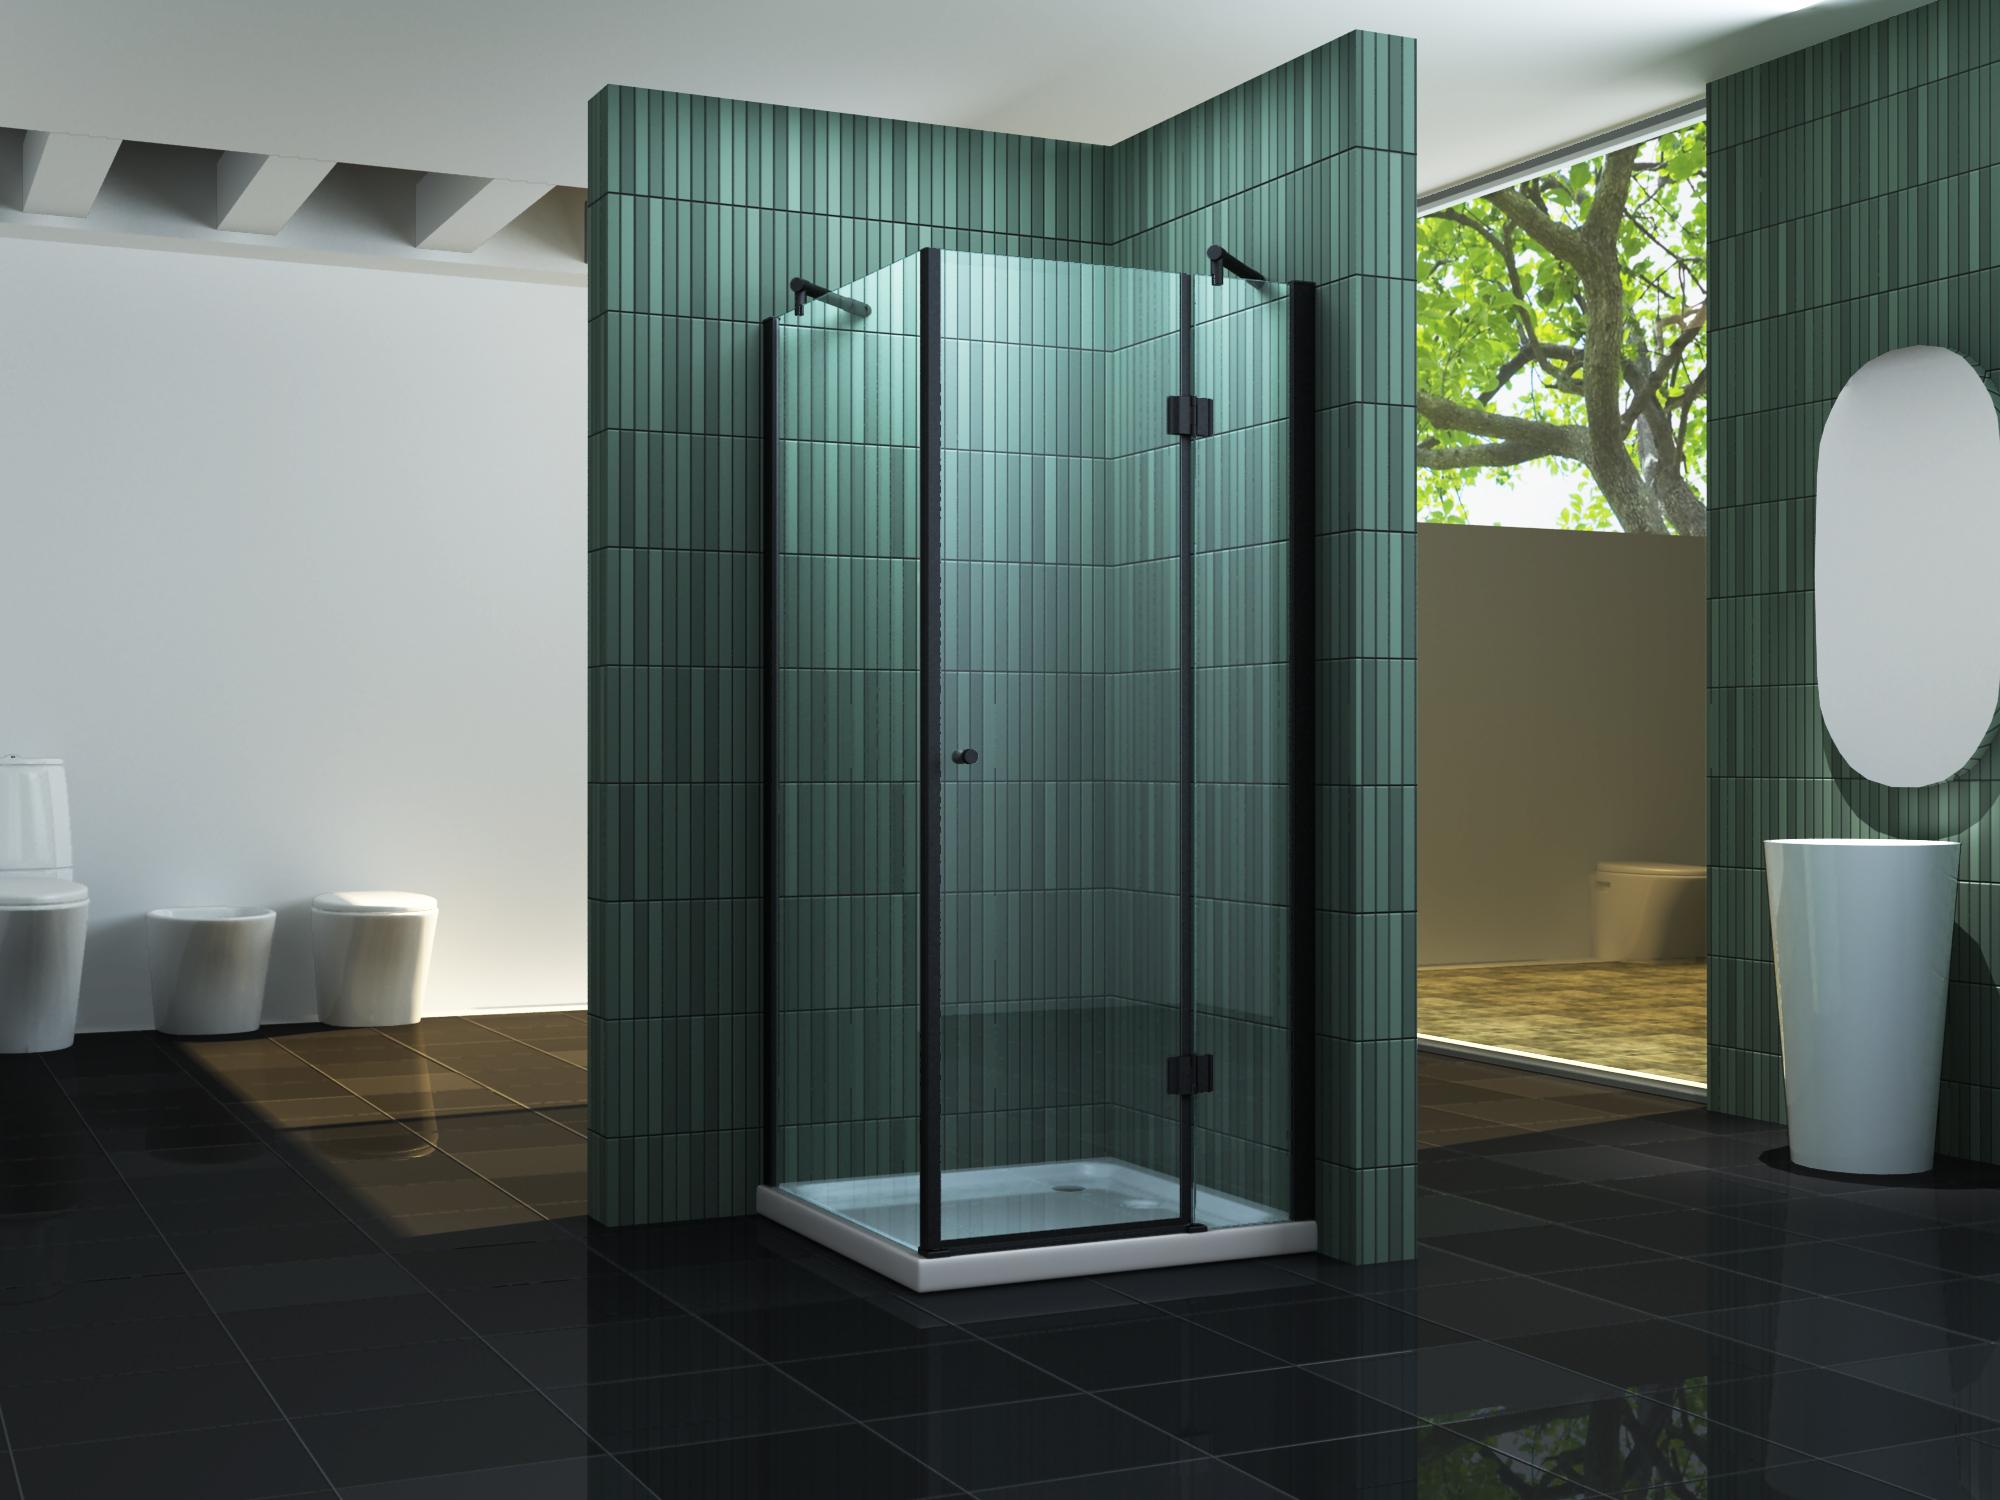 Duschkabine SILL (schwarz) 100 x 100 x 200 cm inkl. Duschtasse